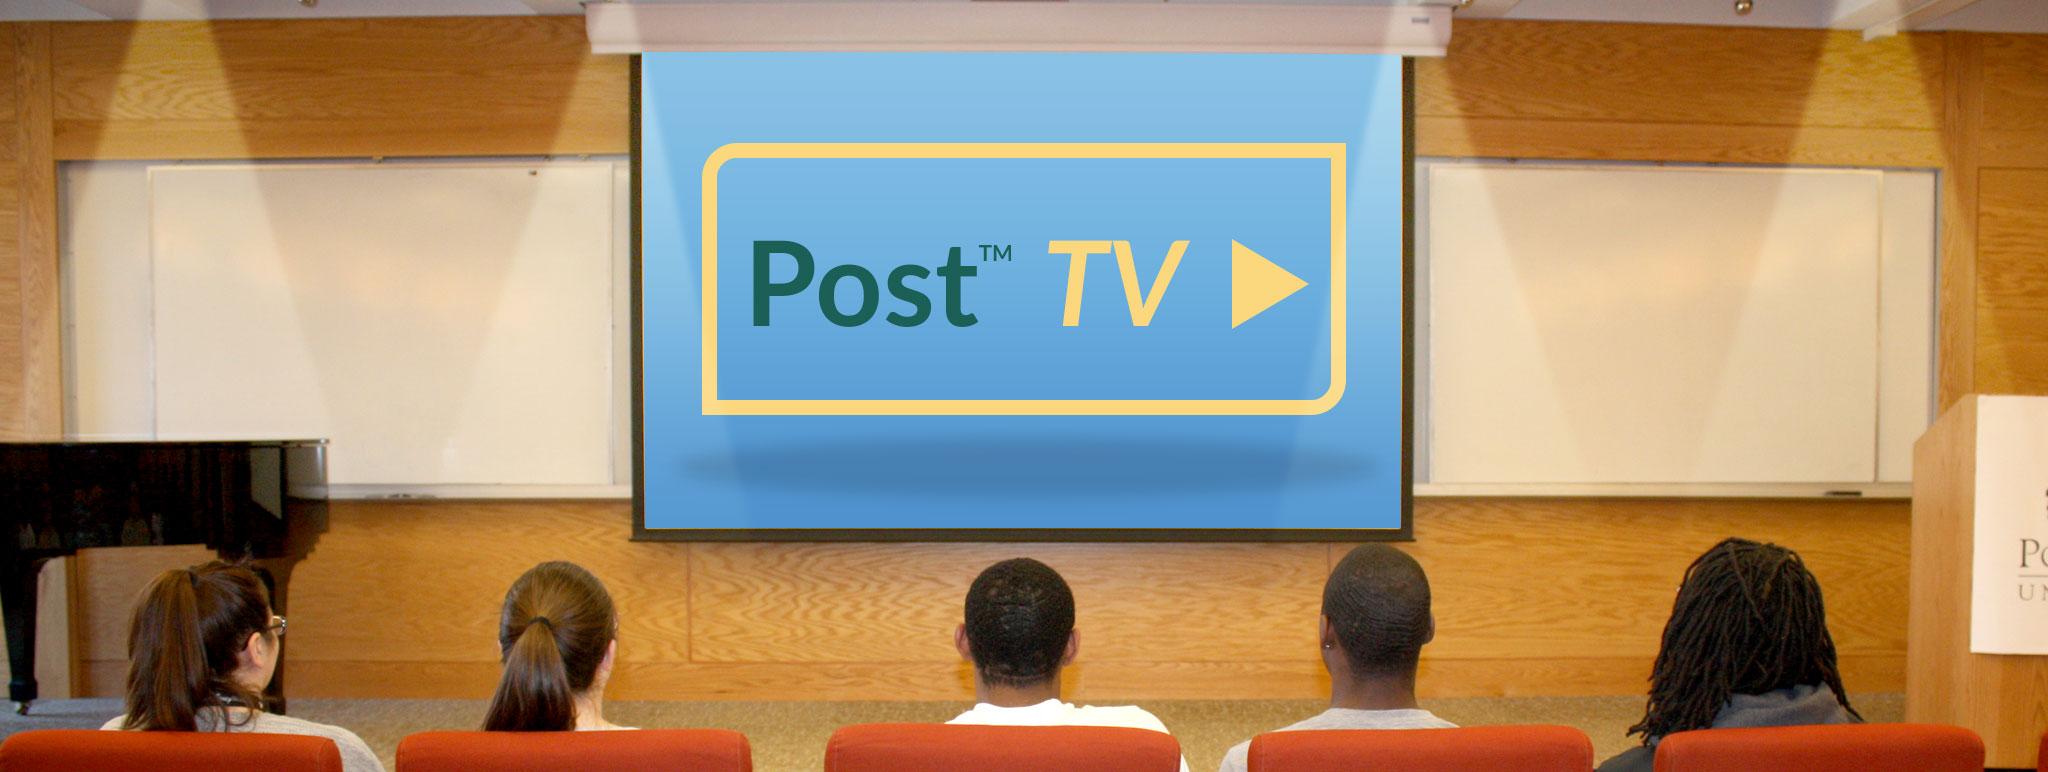 Post TV